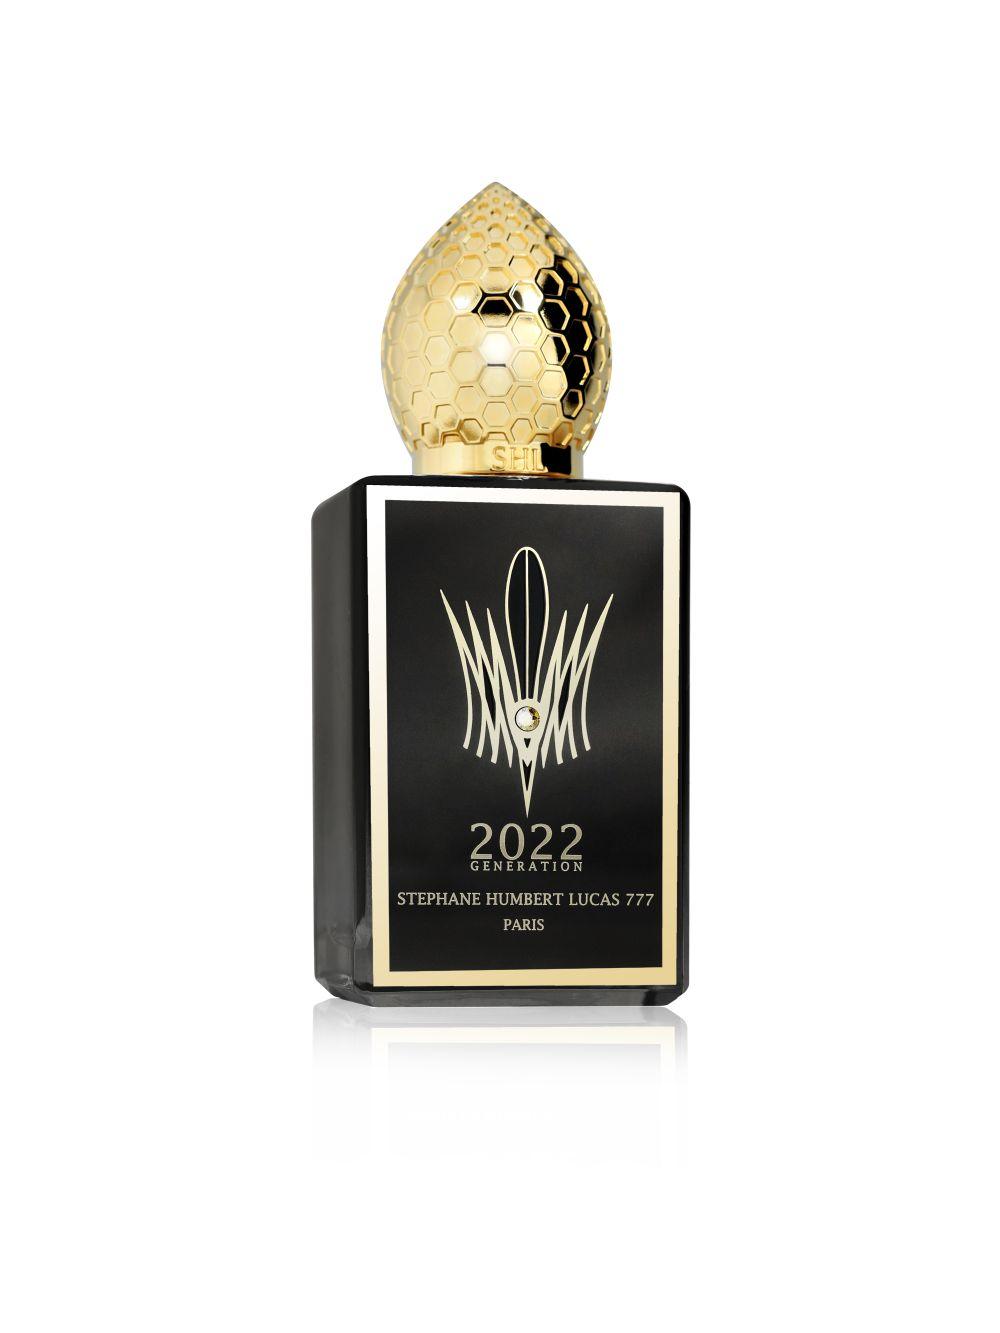 Stéphane Humbert Lucas 777 – 2022 Generation Black - Eau de Parfum 50 ml